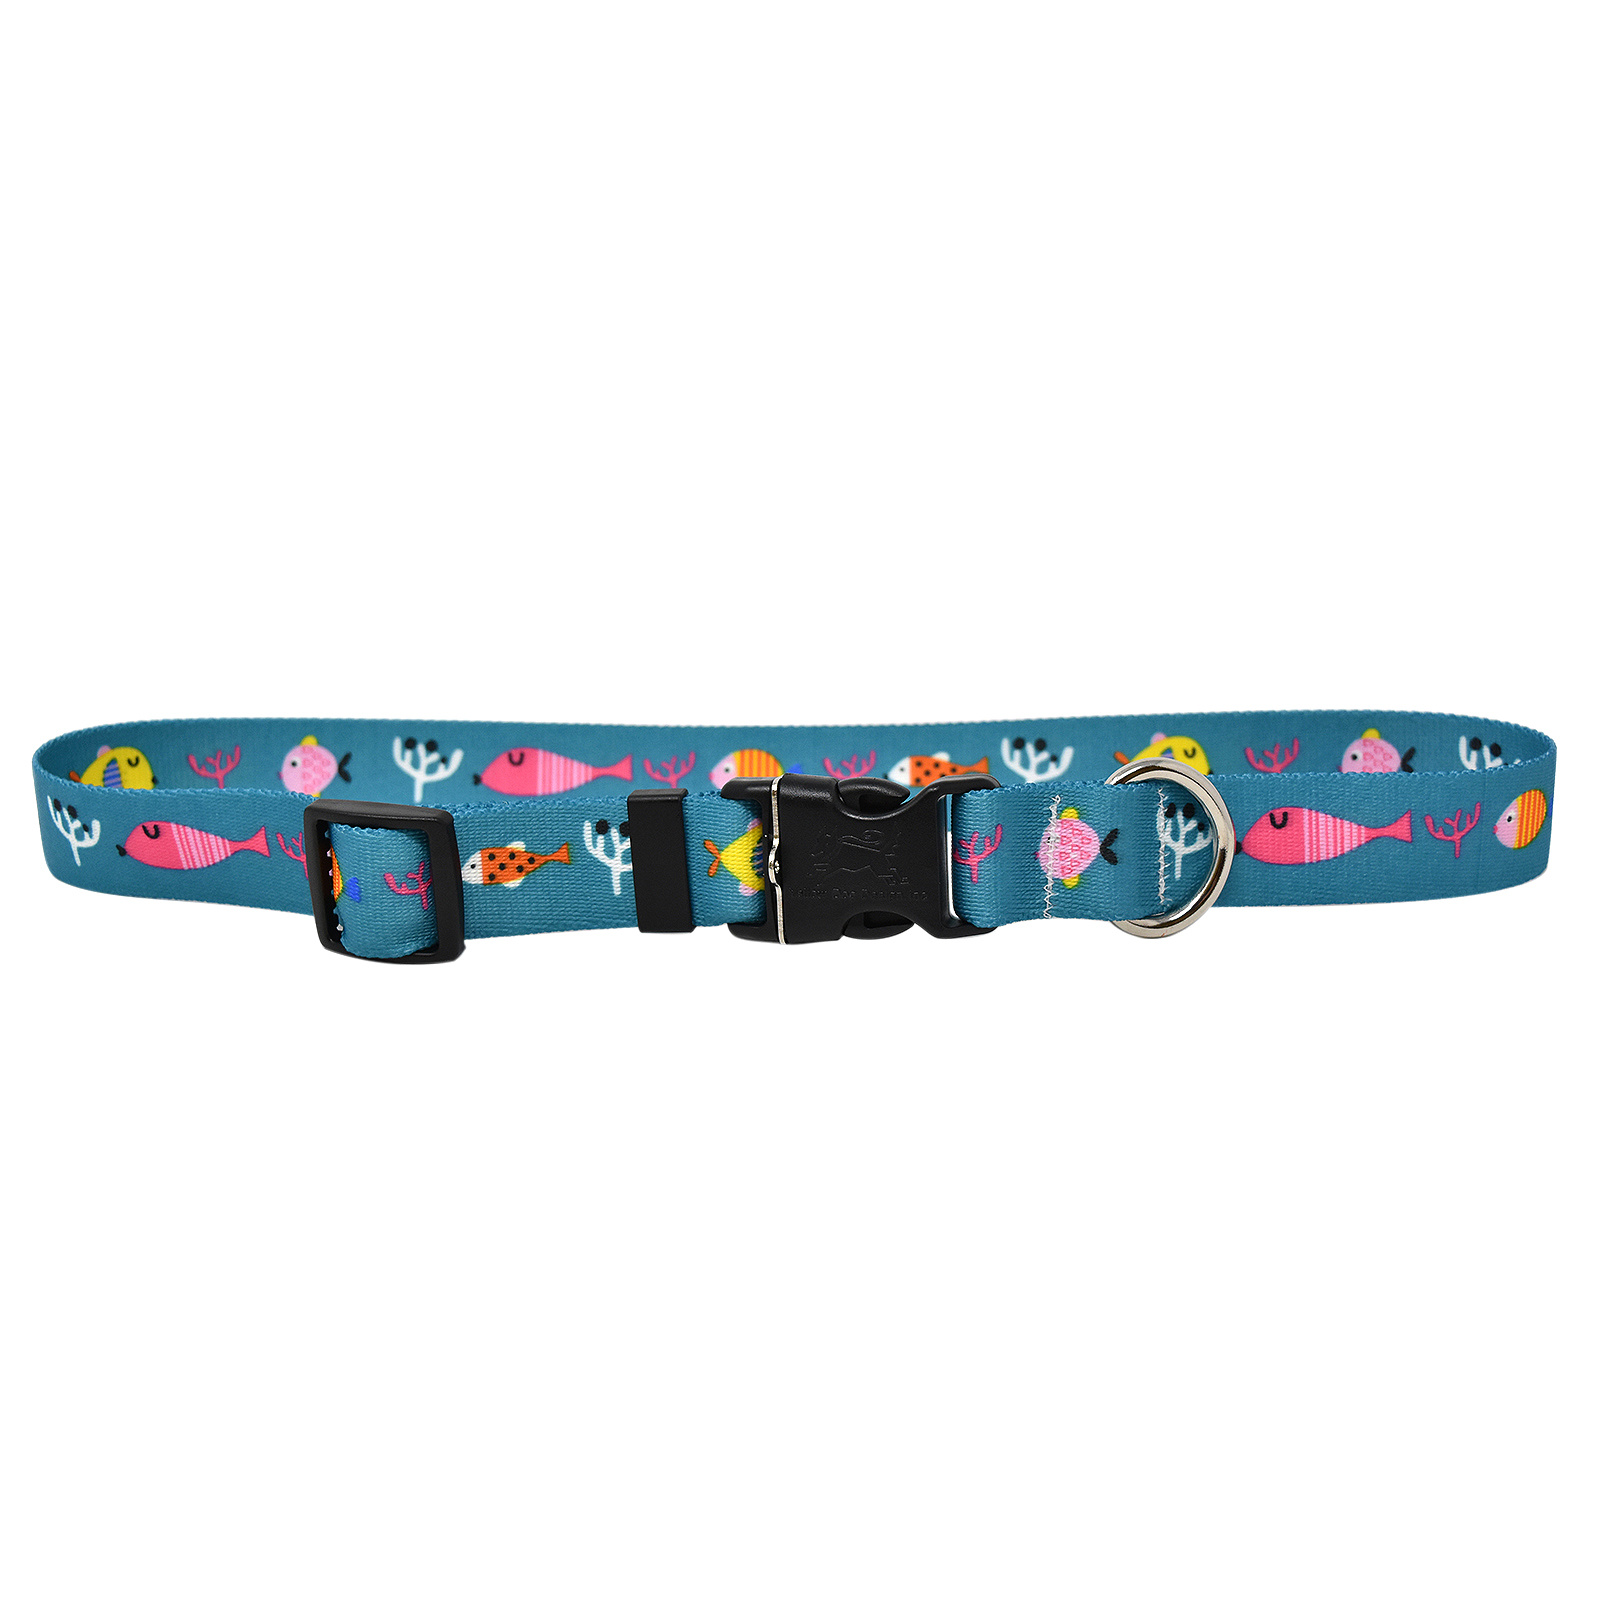 Yellow Dog Design Yellow Dog - Cat Collar - Ocean Friends